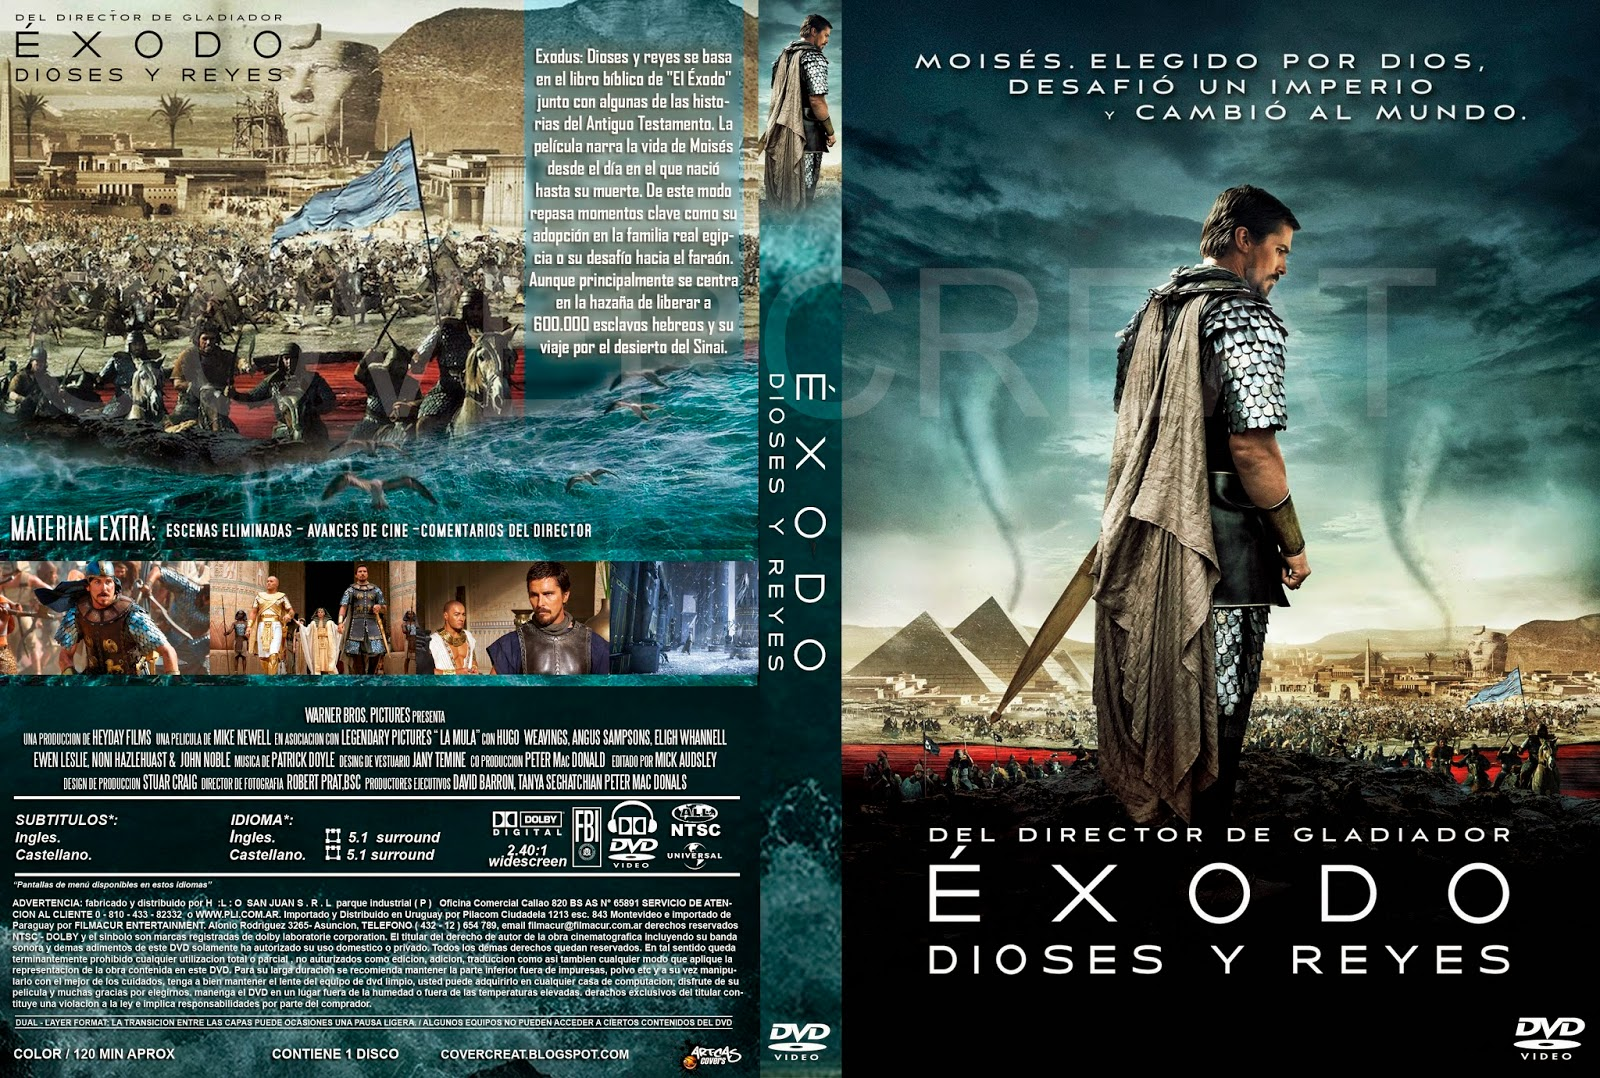 Exodo Online Gratis Subtitulada Apocalipsis Pelicula Completa En Espanol Online Gratis